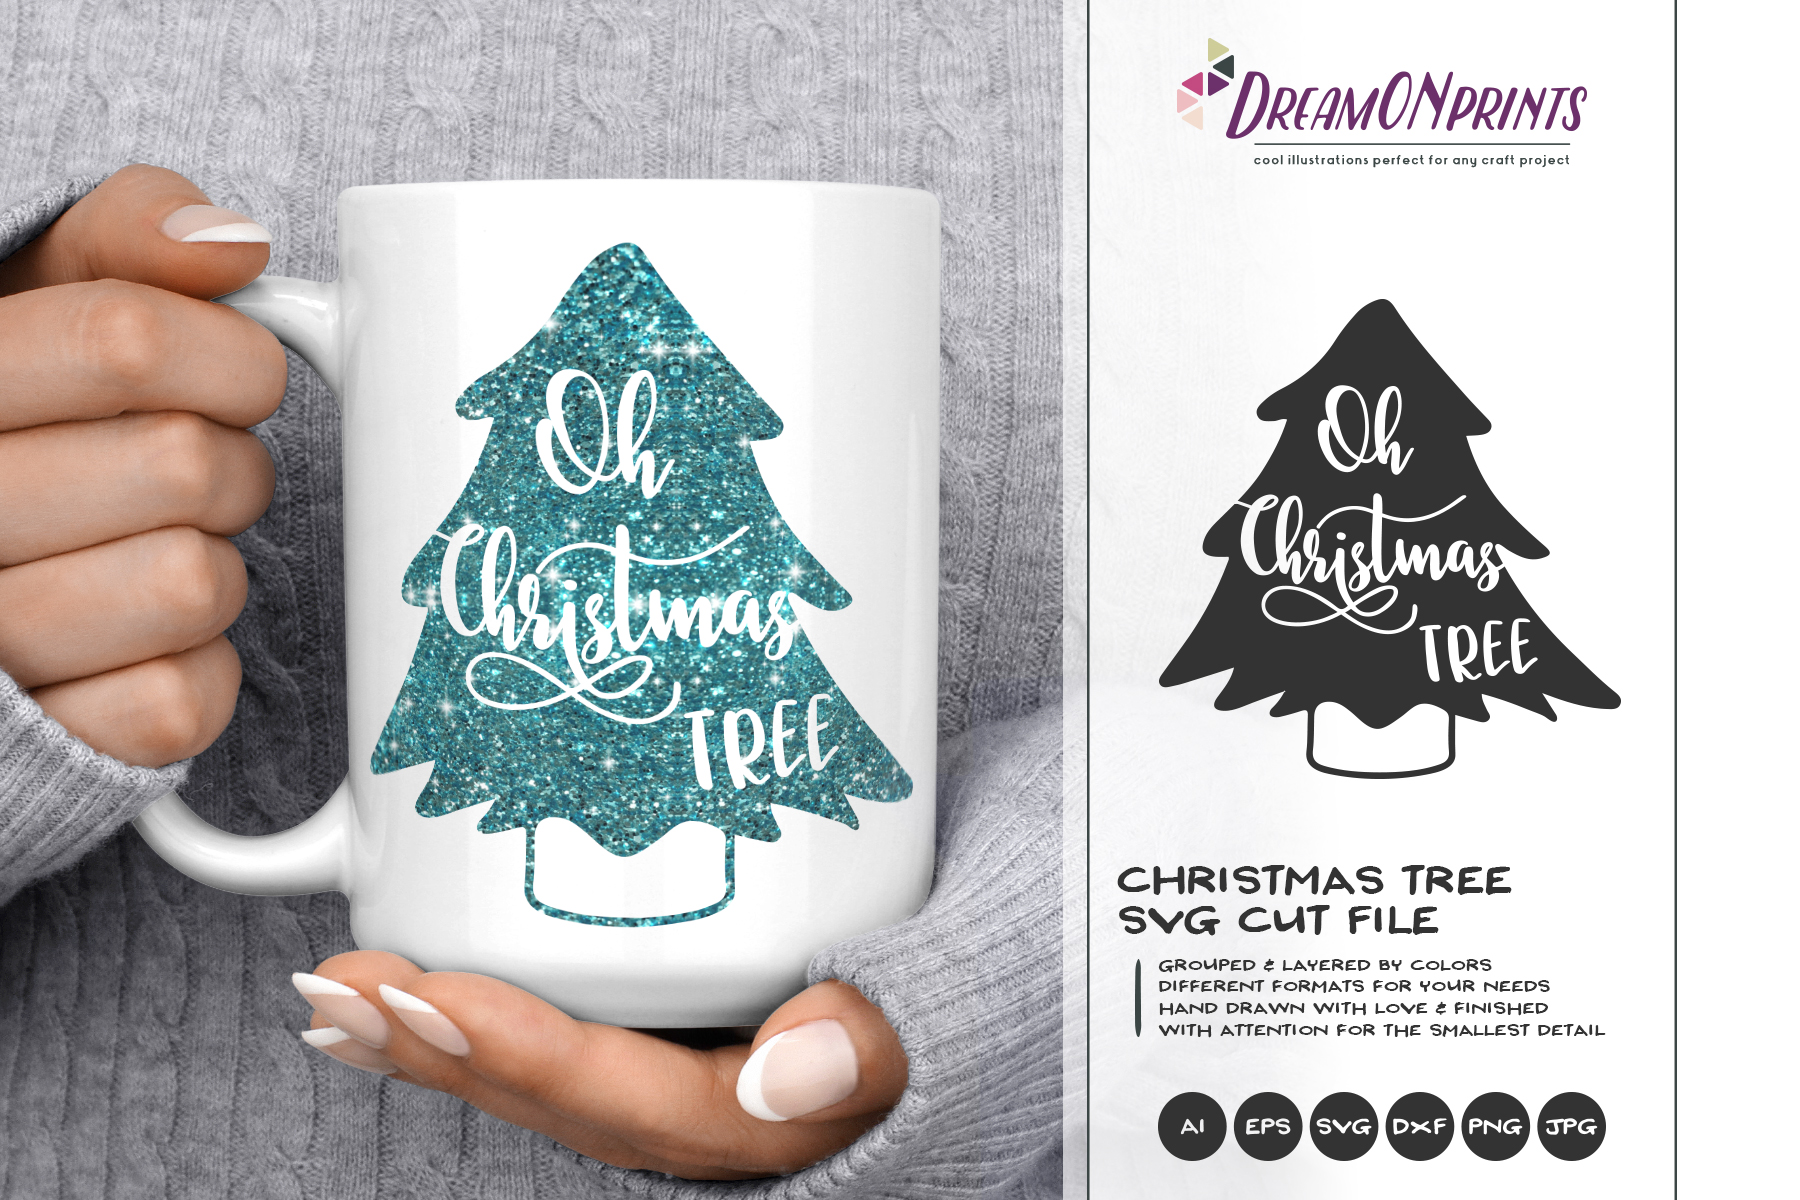 Oh Christmas Tree SVG  Christmas SVG Cut Files example image 1